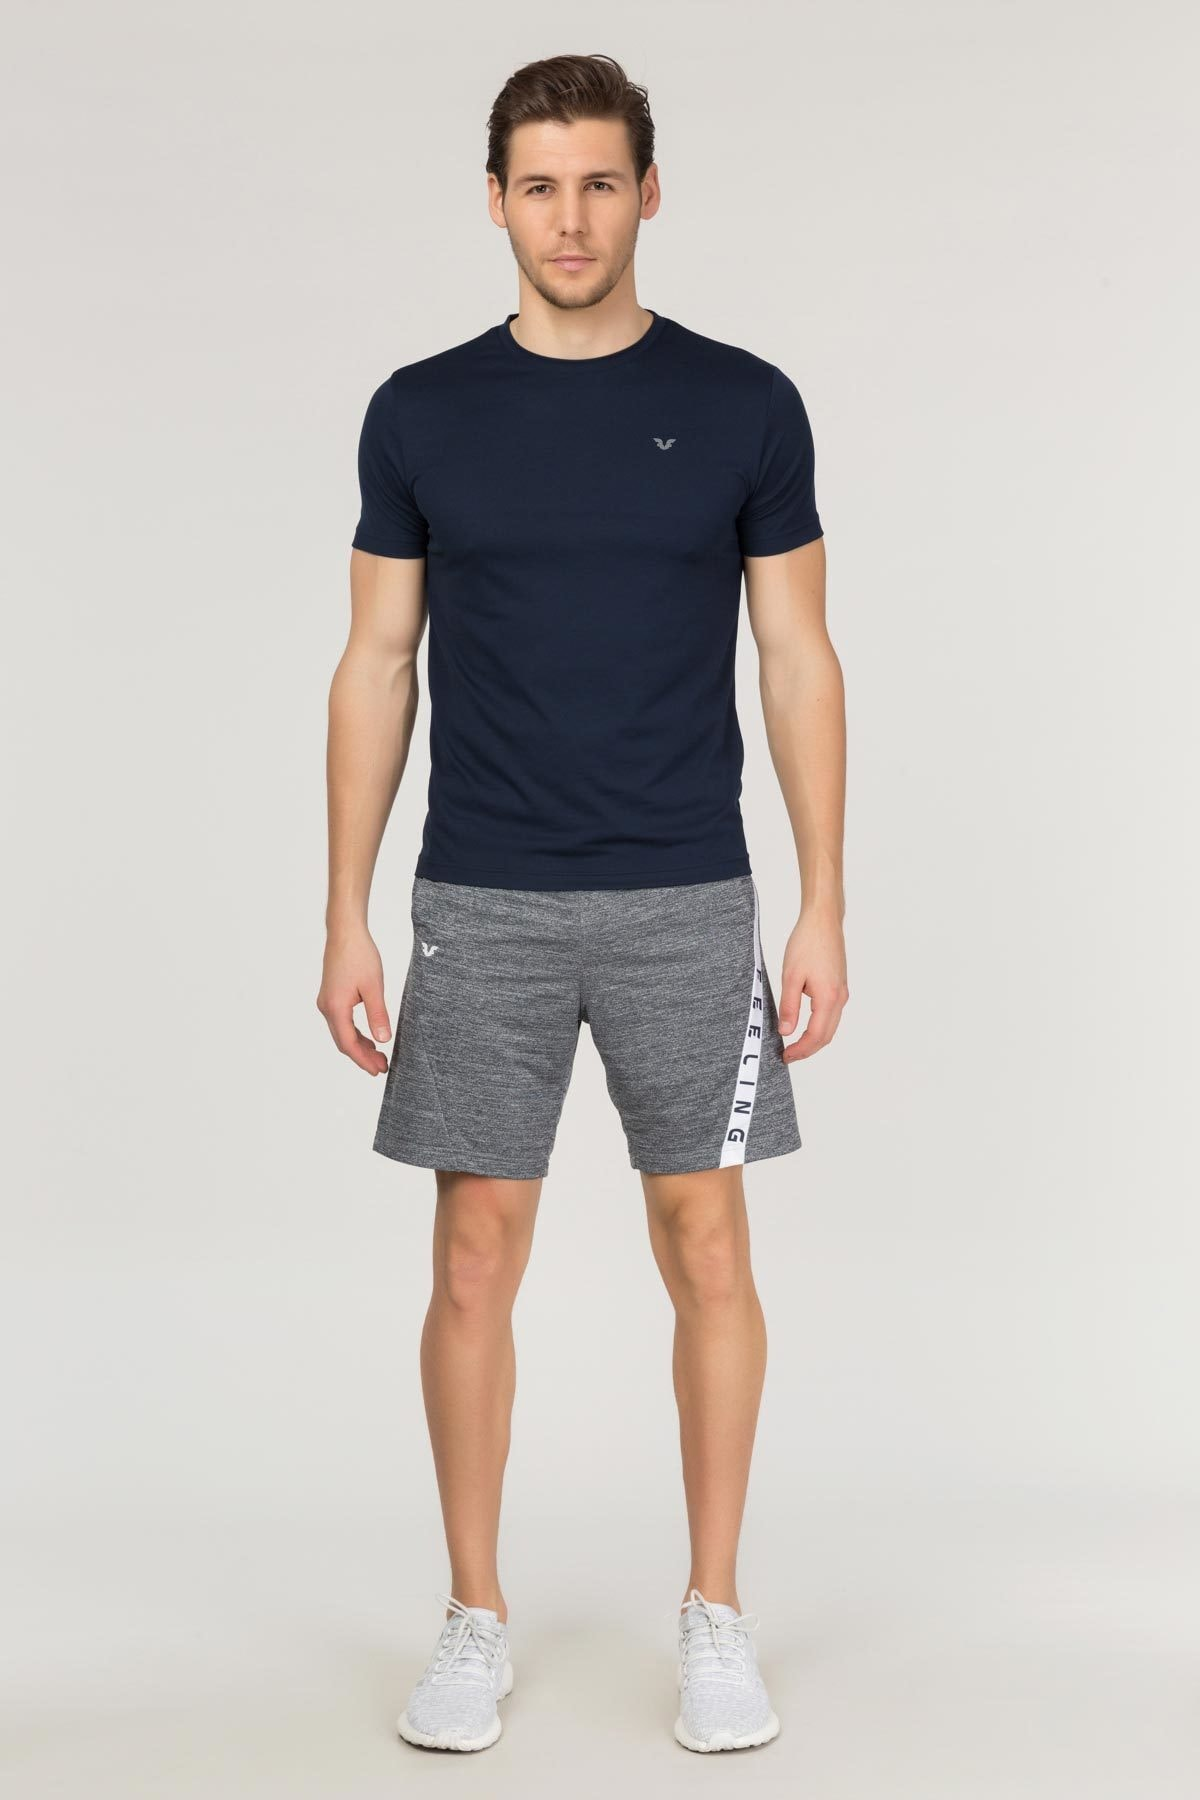 bilcee Lacivert Erkek Antrenman T-Shirt FS-1332 1